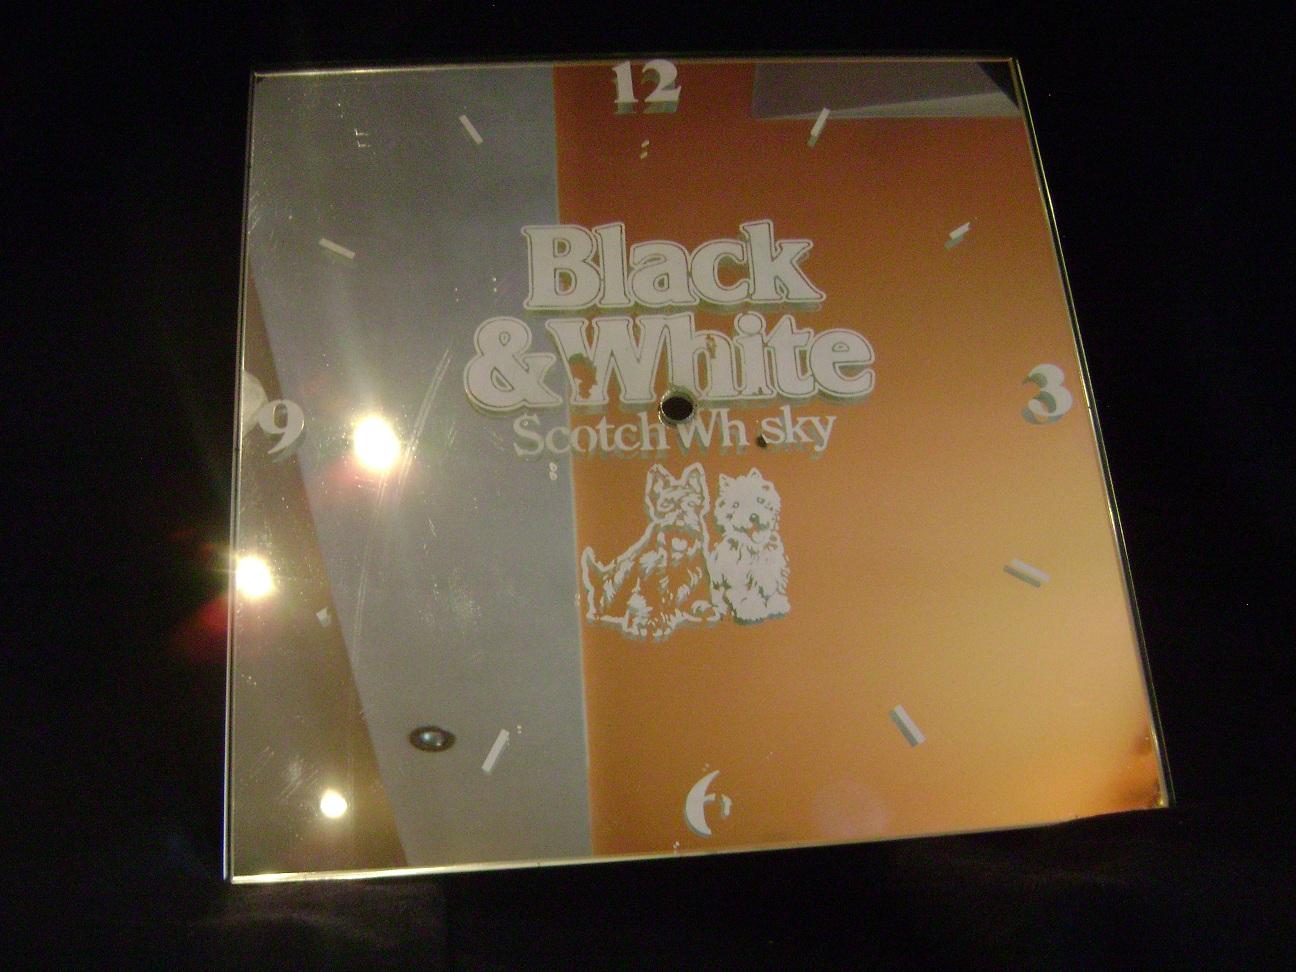 Ogledalo_reklama_Black__White_whisky_1.JPG